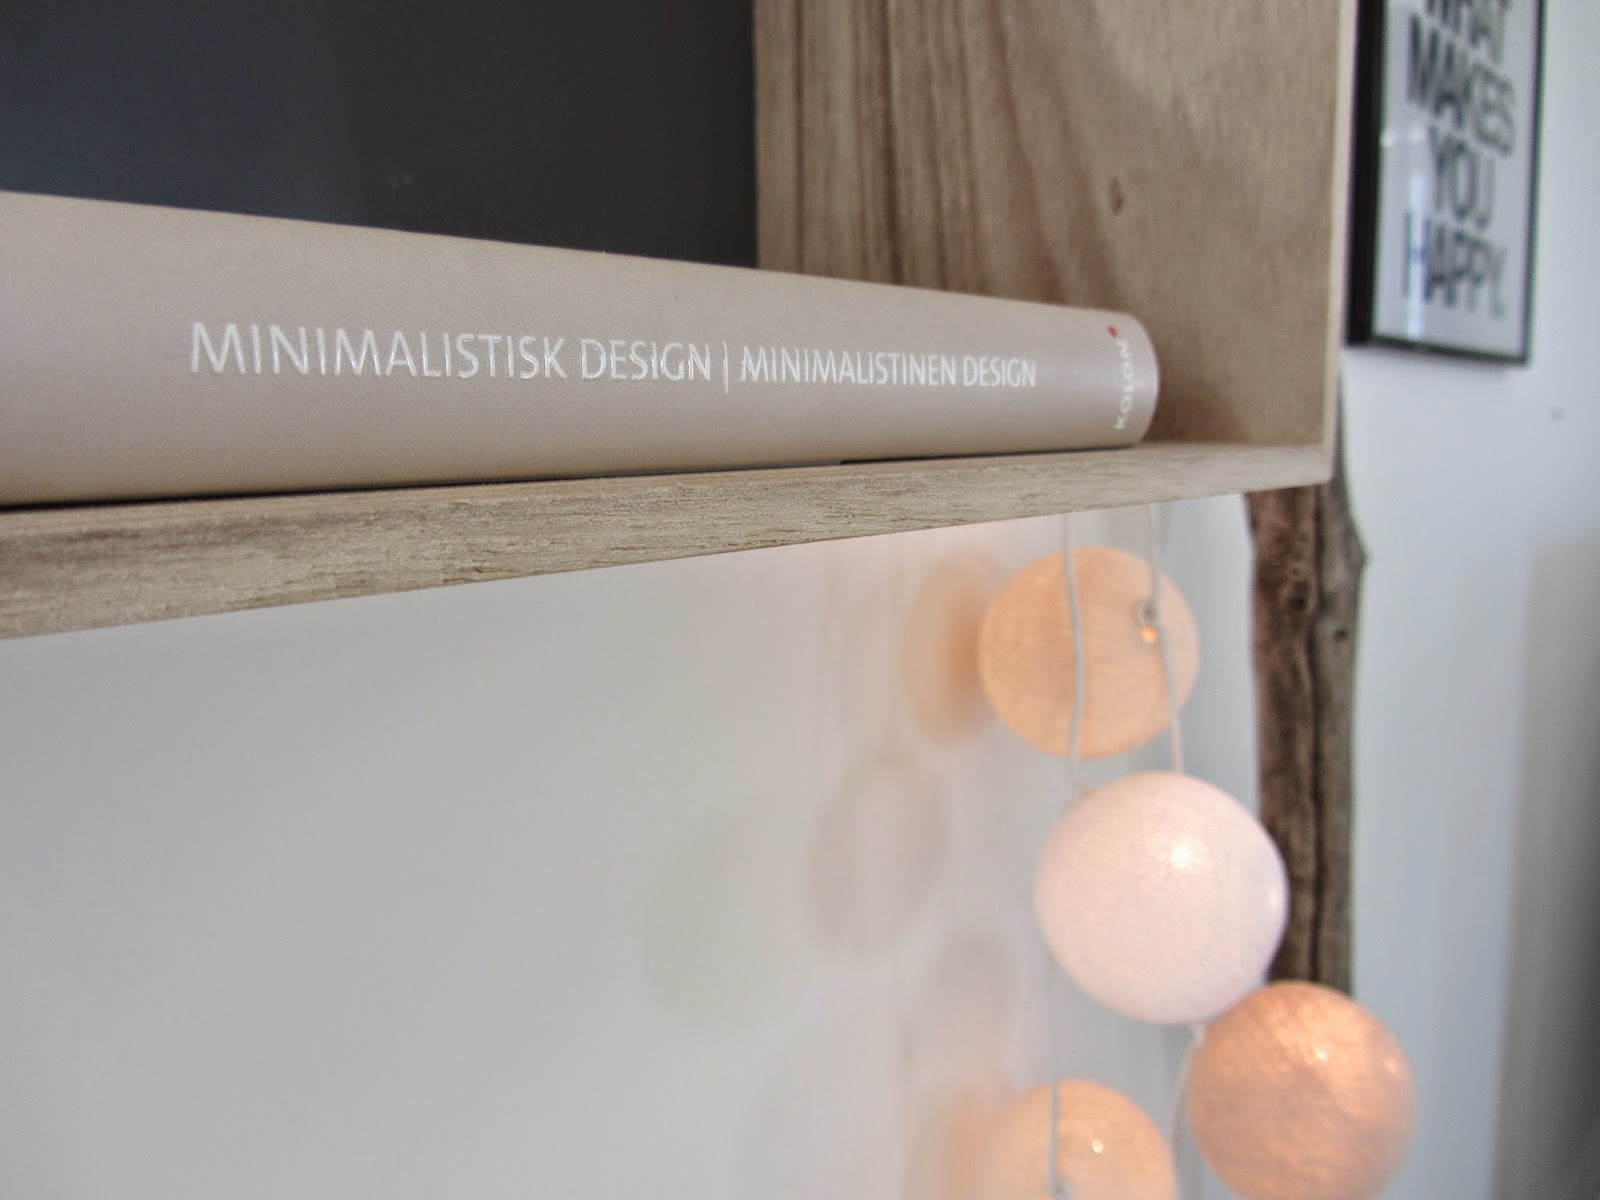 Lesekrok i stuen som tar minimal plass (the i word)